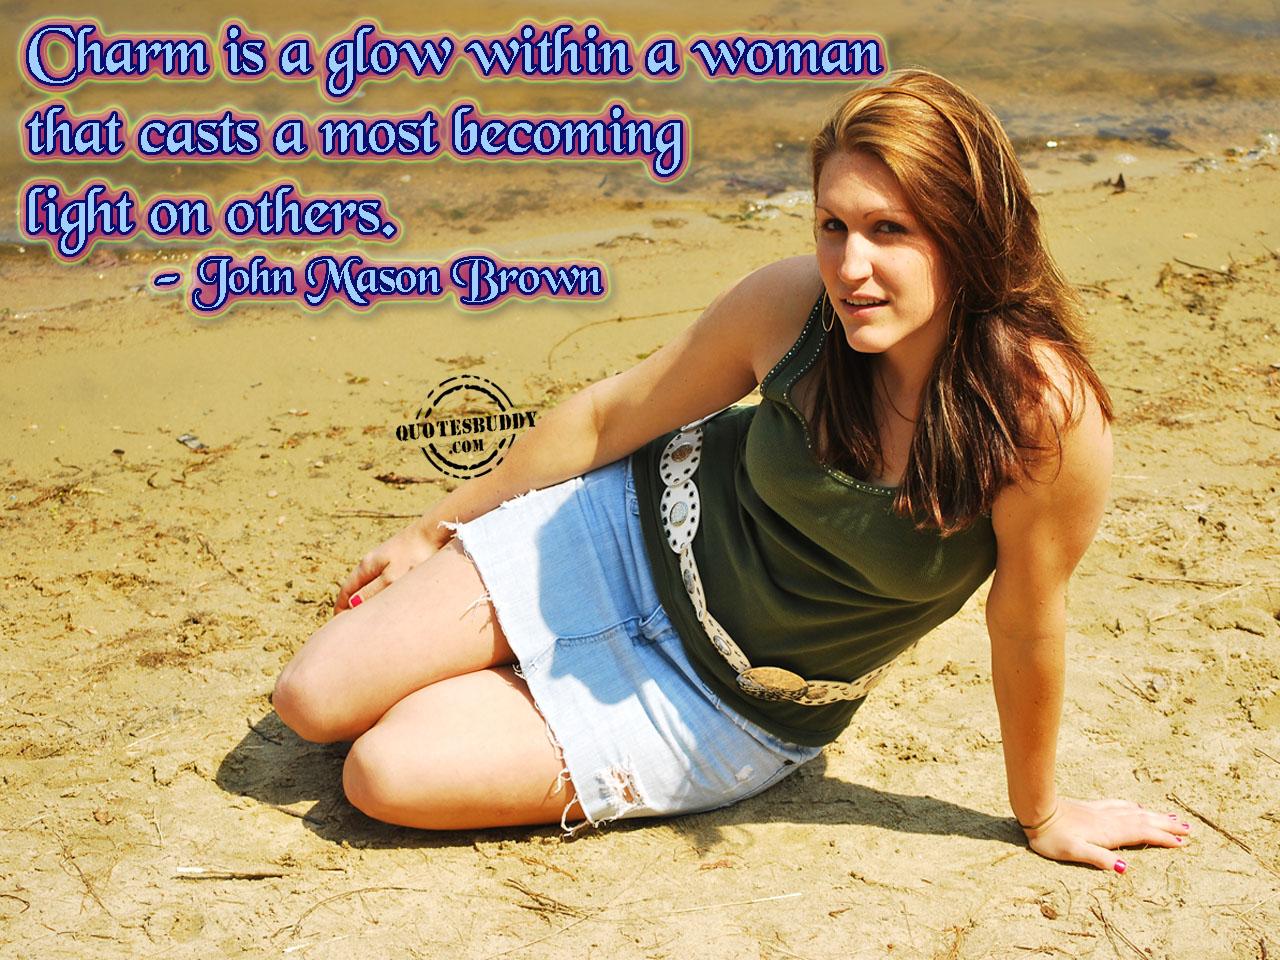 John Mason Brown's quote #5